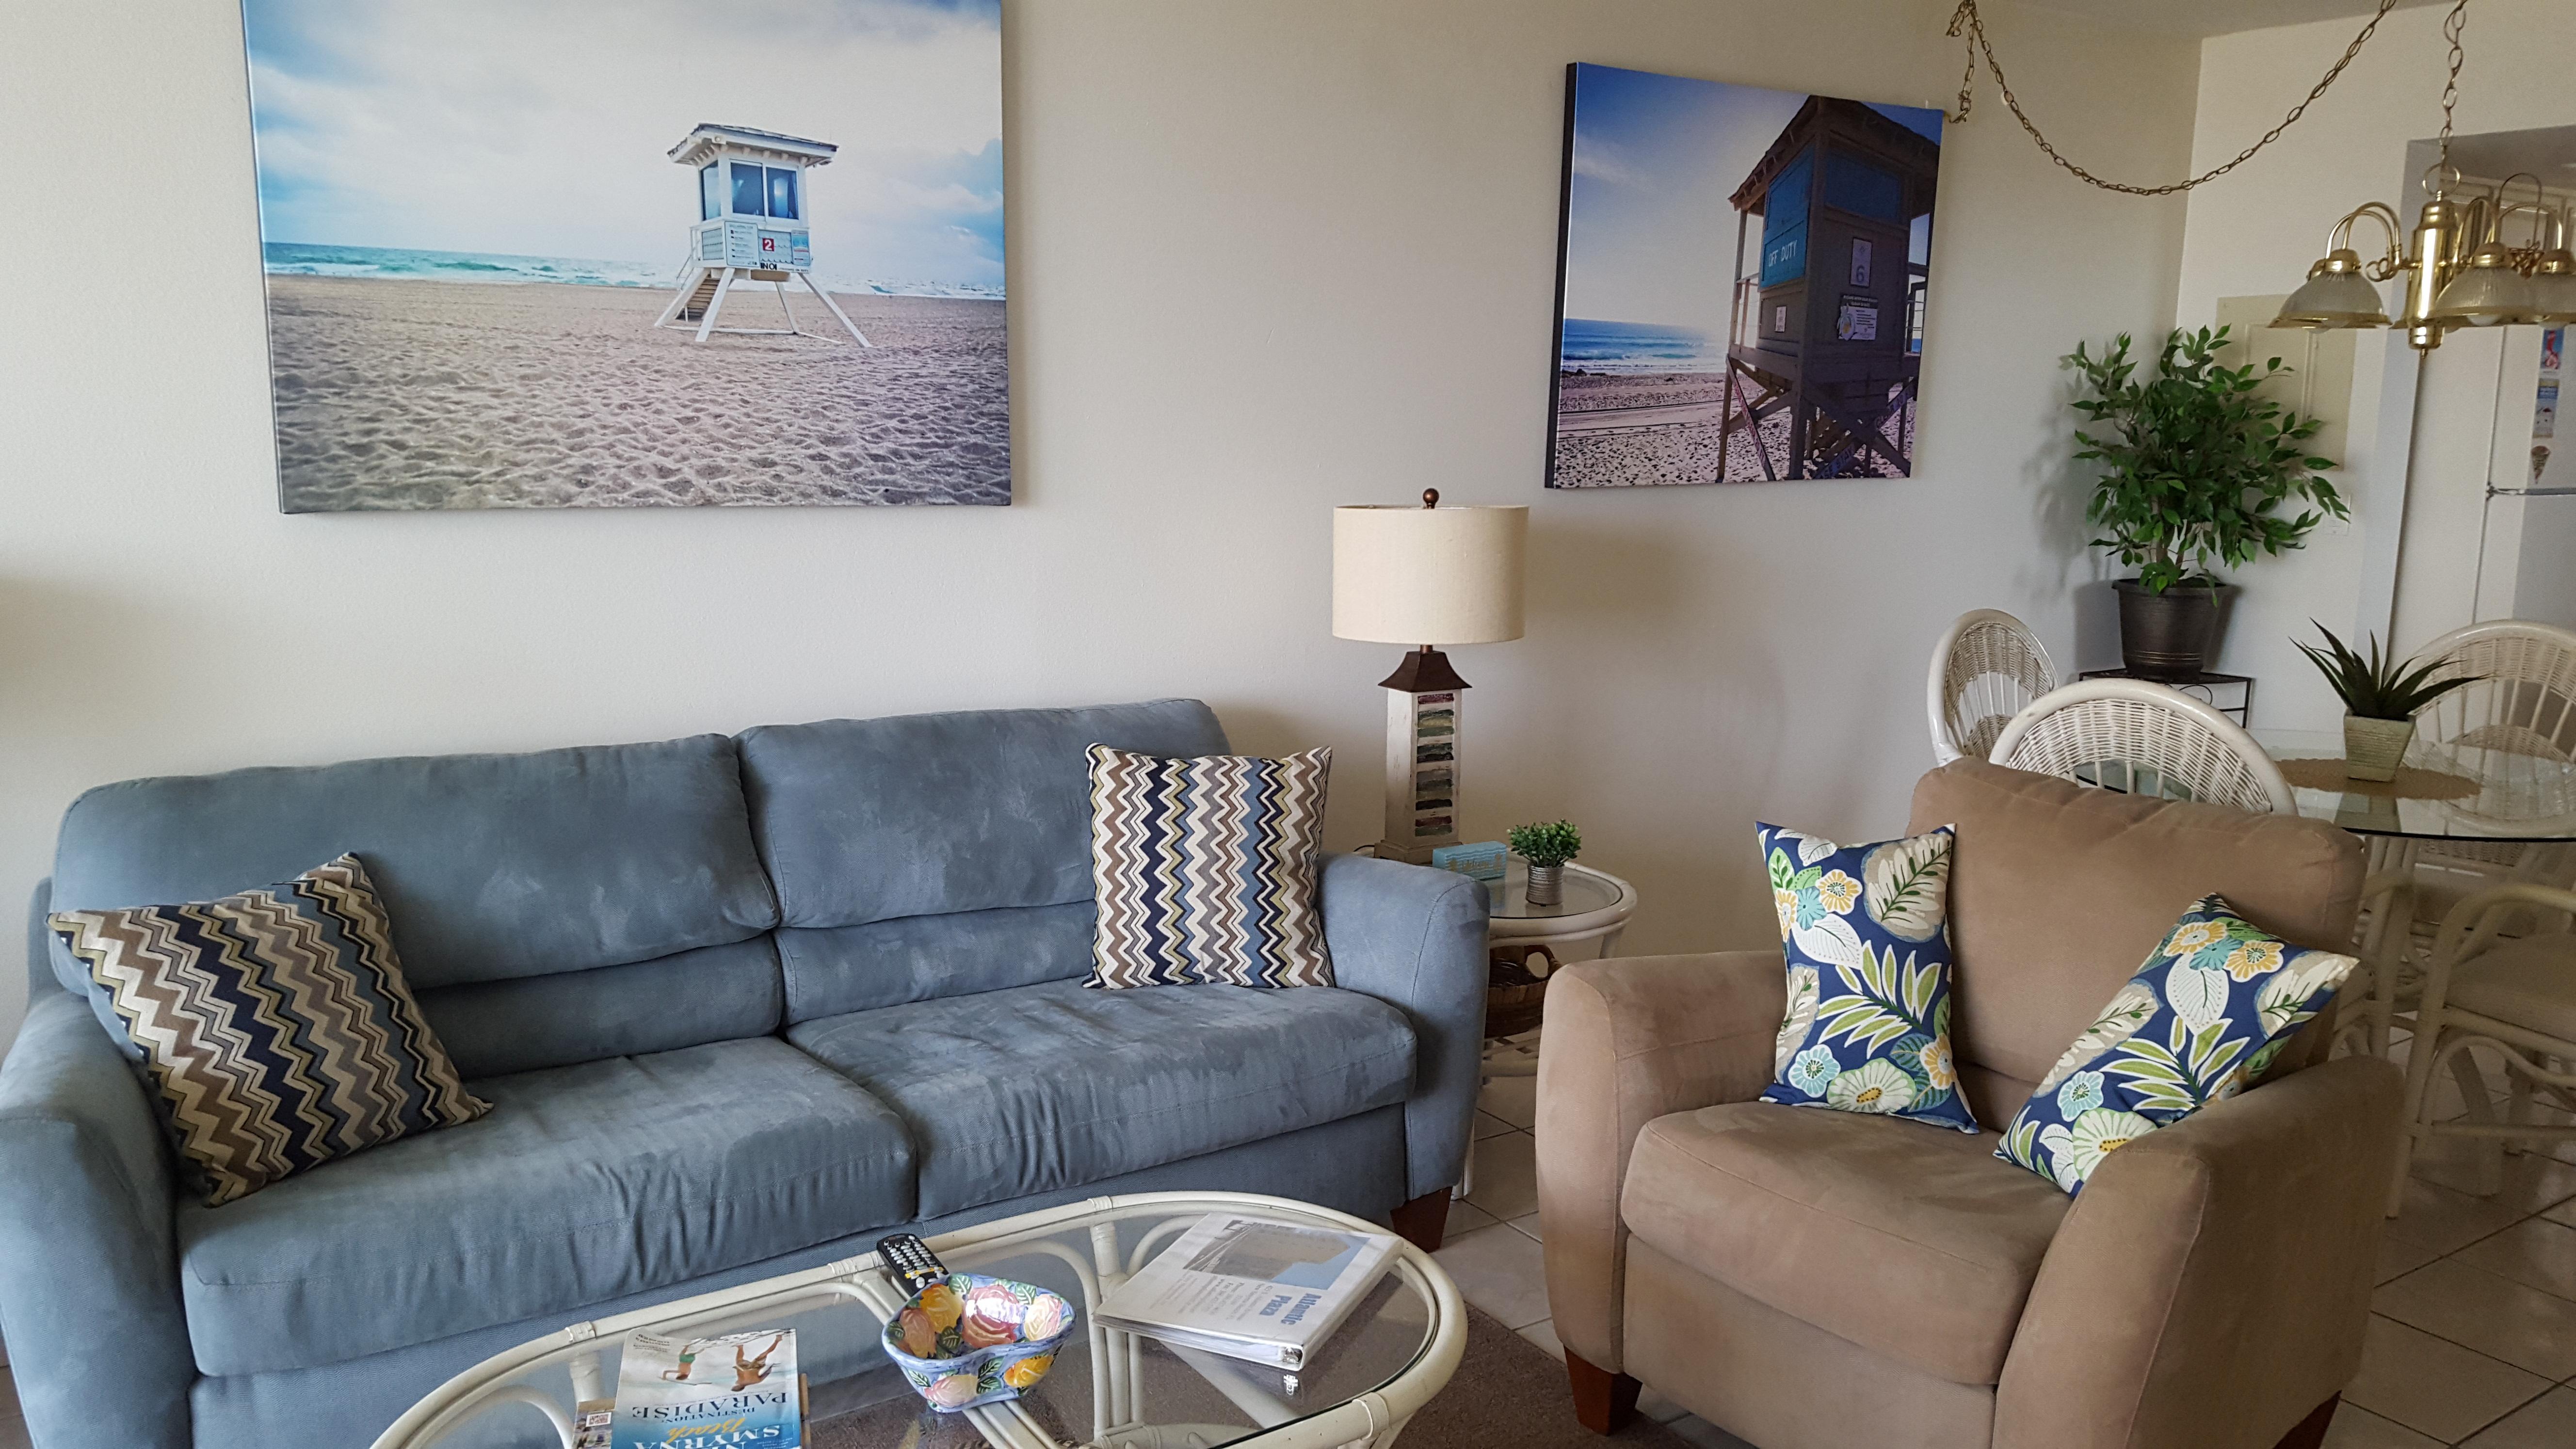 Living room center view